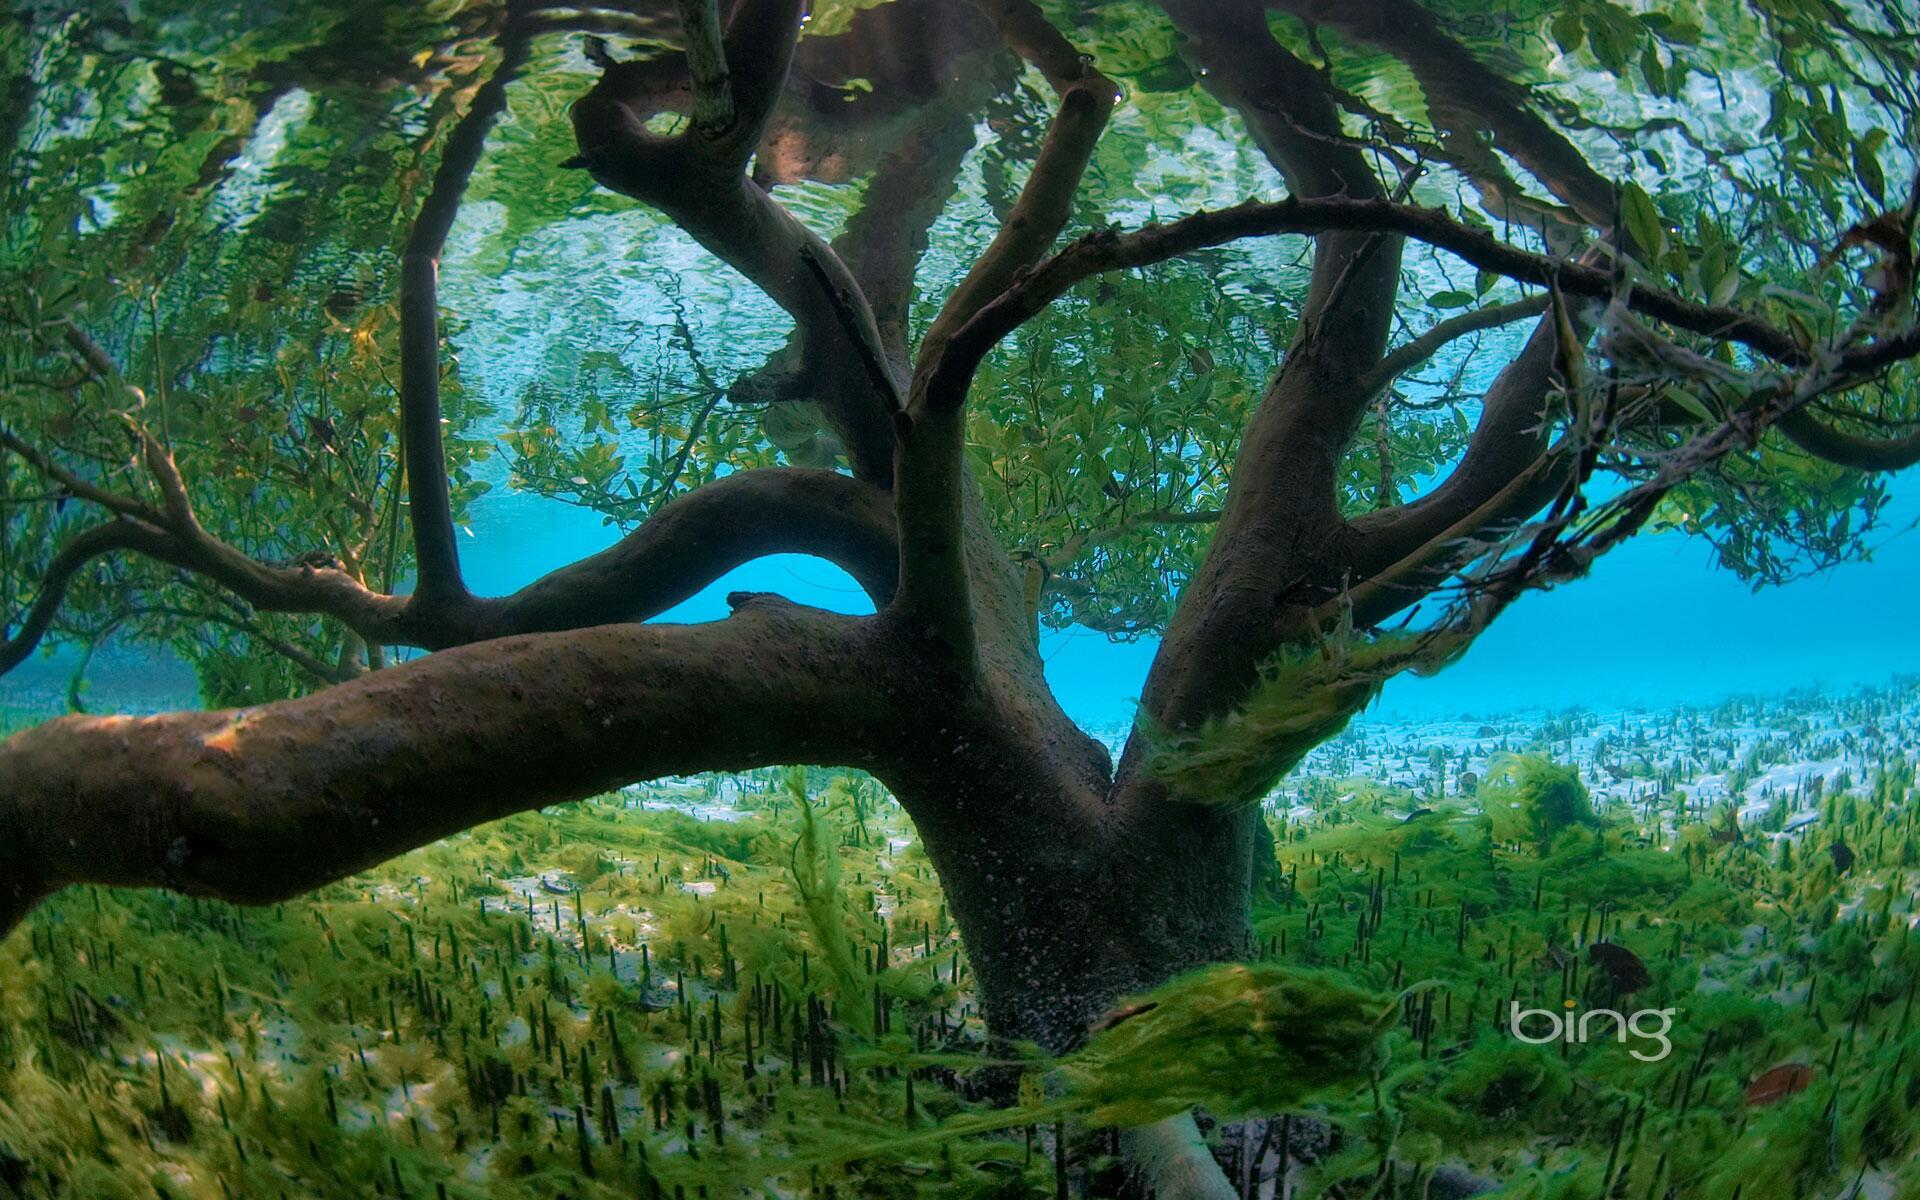 An Underwater Mangrove in Aldabra, Seychelles http://t.co/MhmUjbgpRC